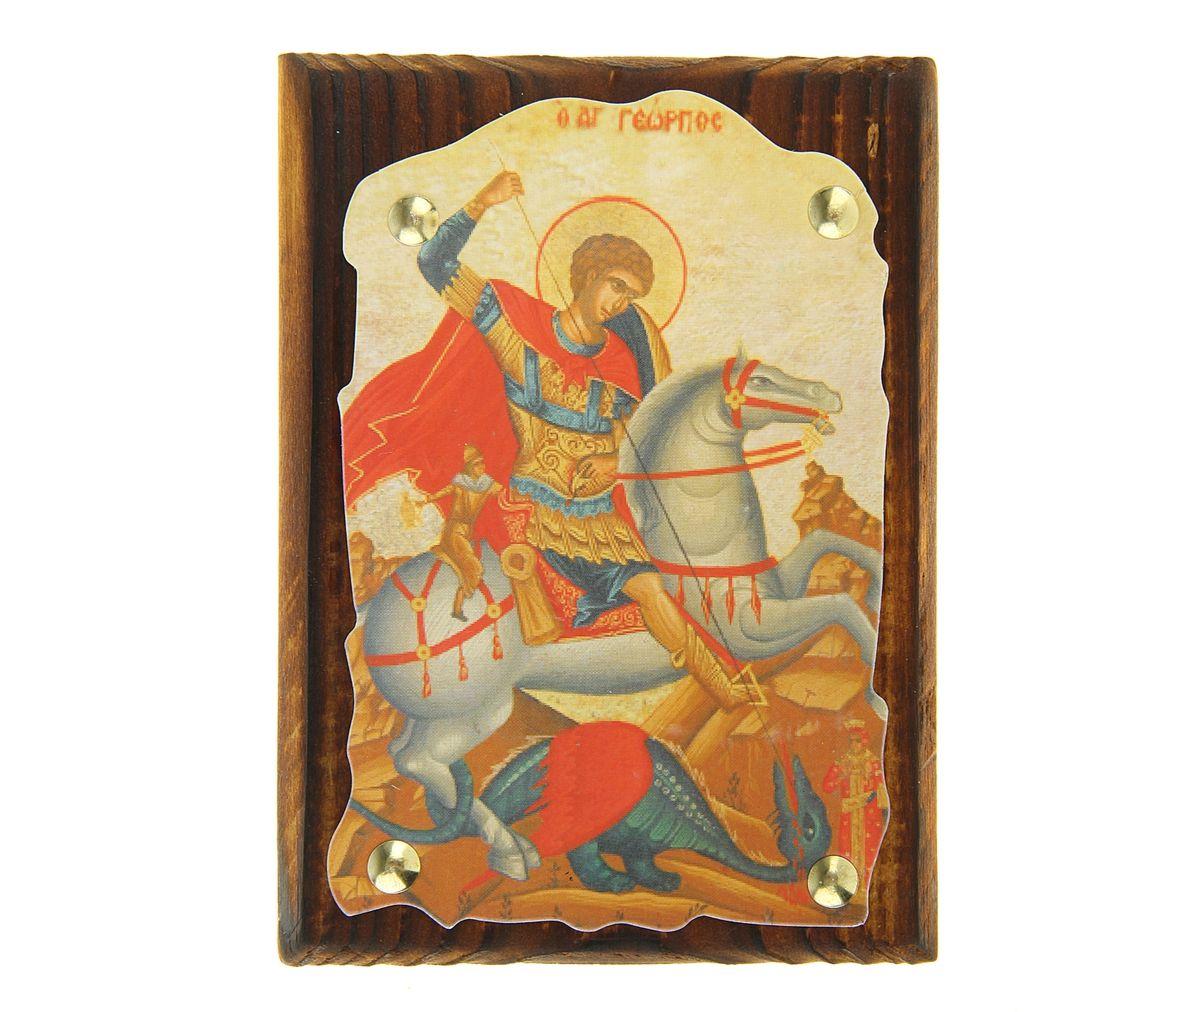 Икона Георгий Победоносец, 10,5 х 14,5 см икона янтарная богородица скоропослушница кян 2 305